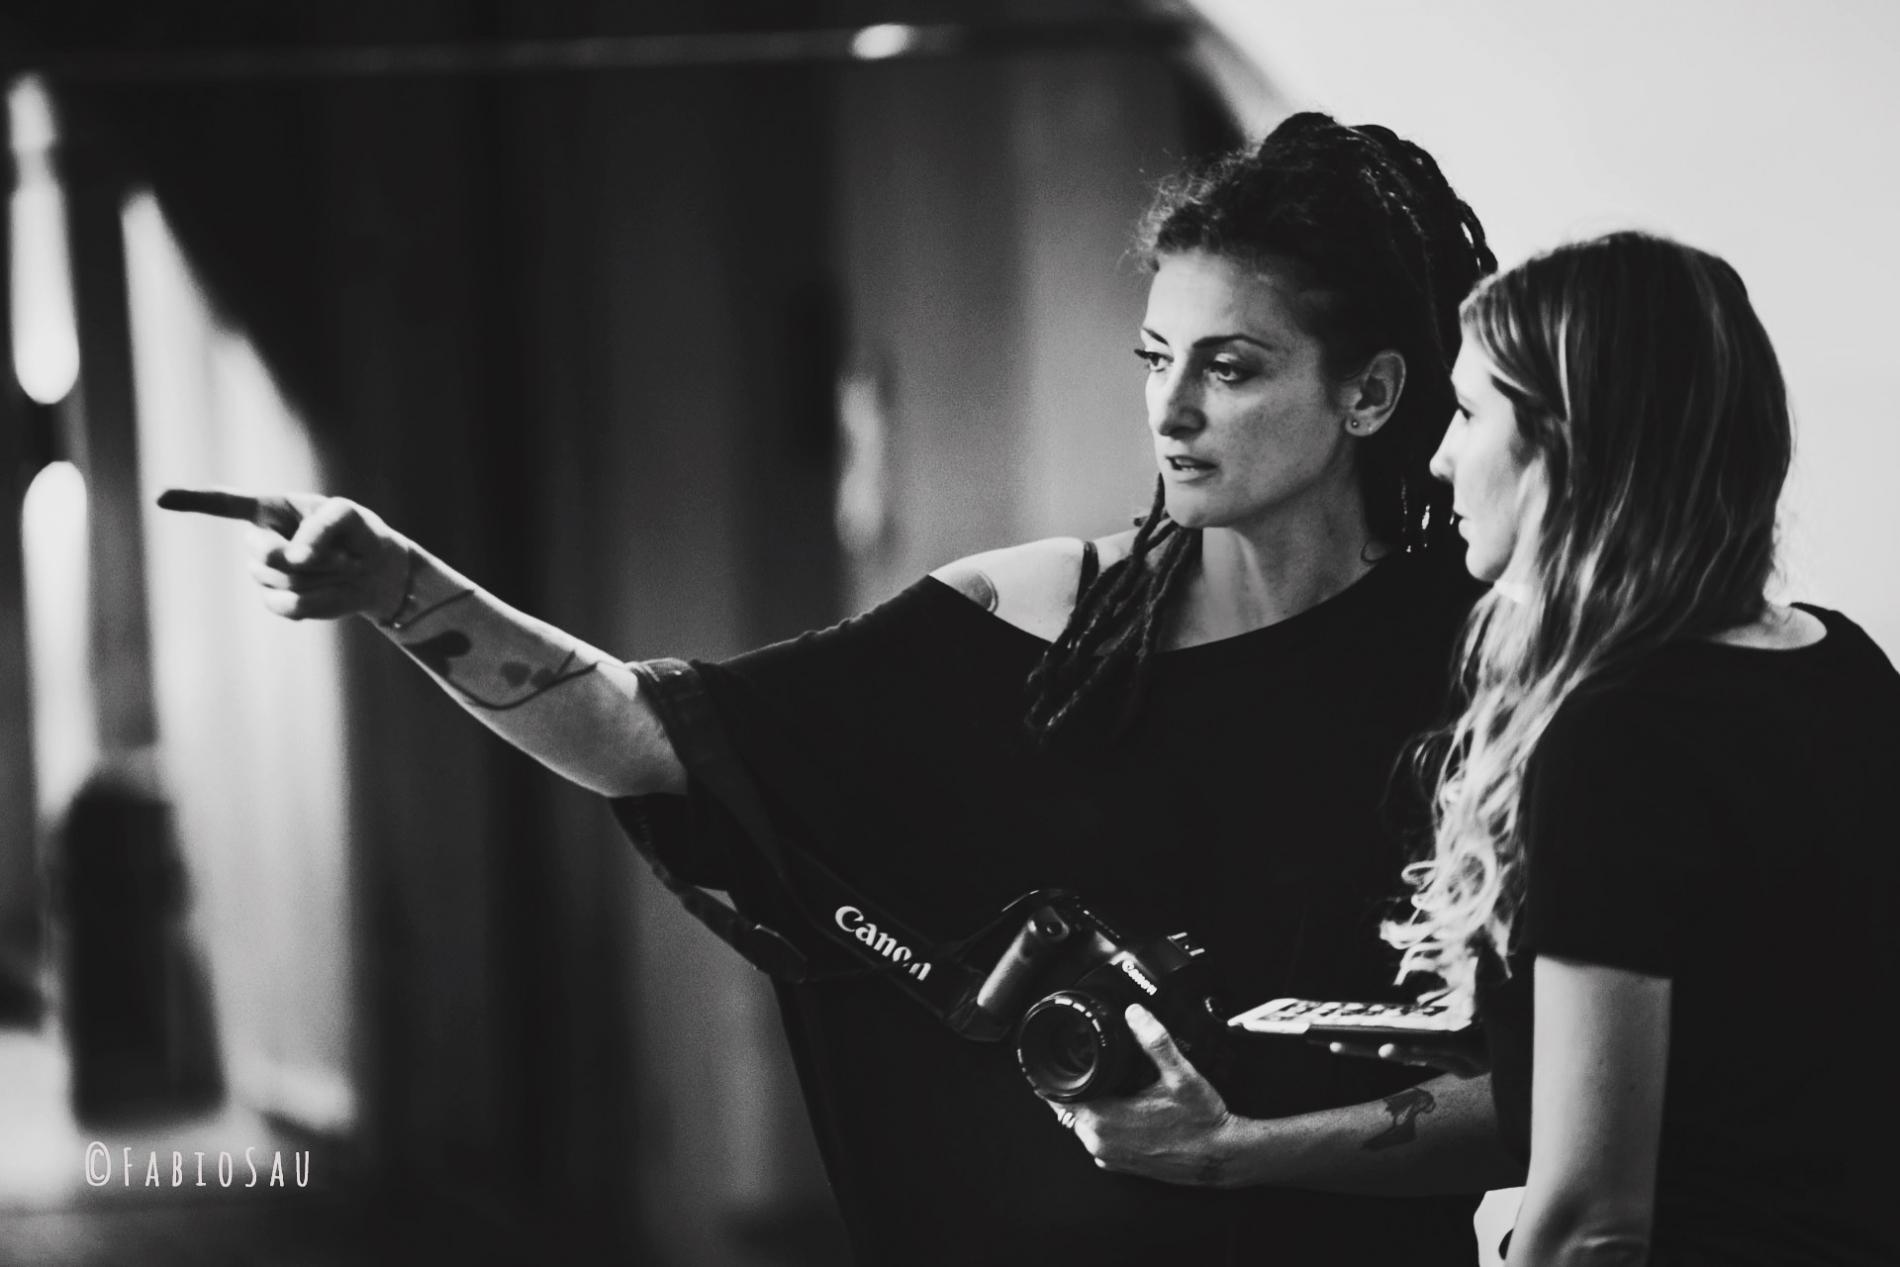 Melissa Iannace Wedding Photographer during a recent shoot